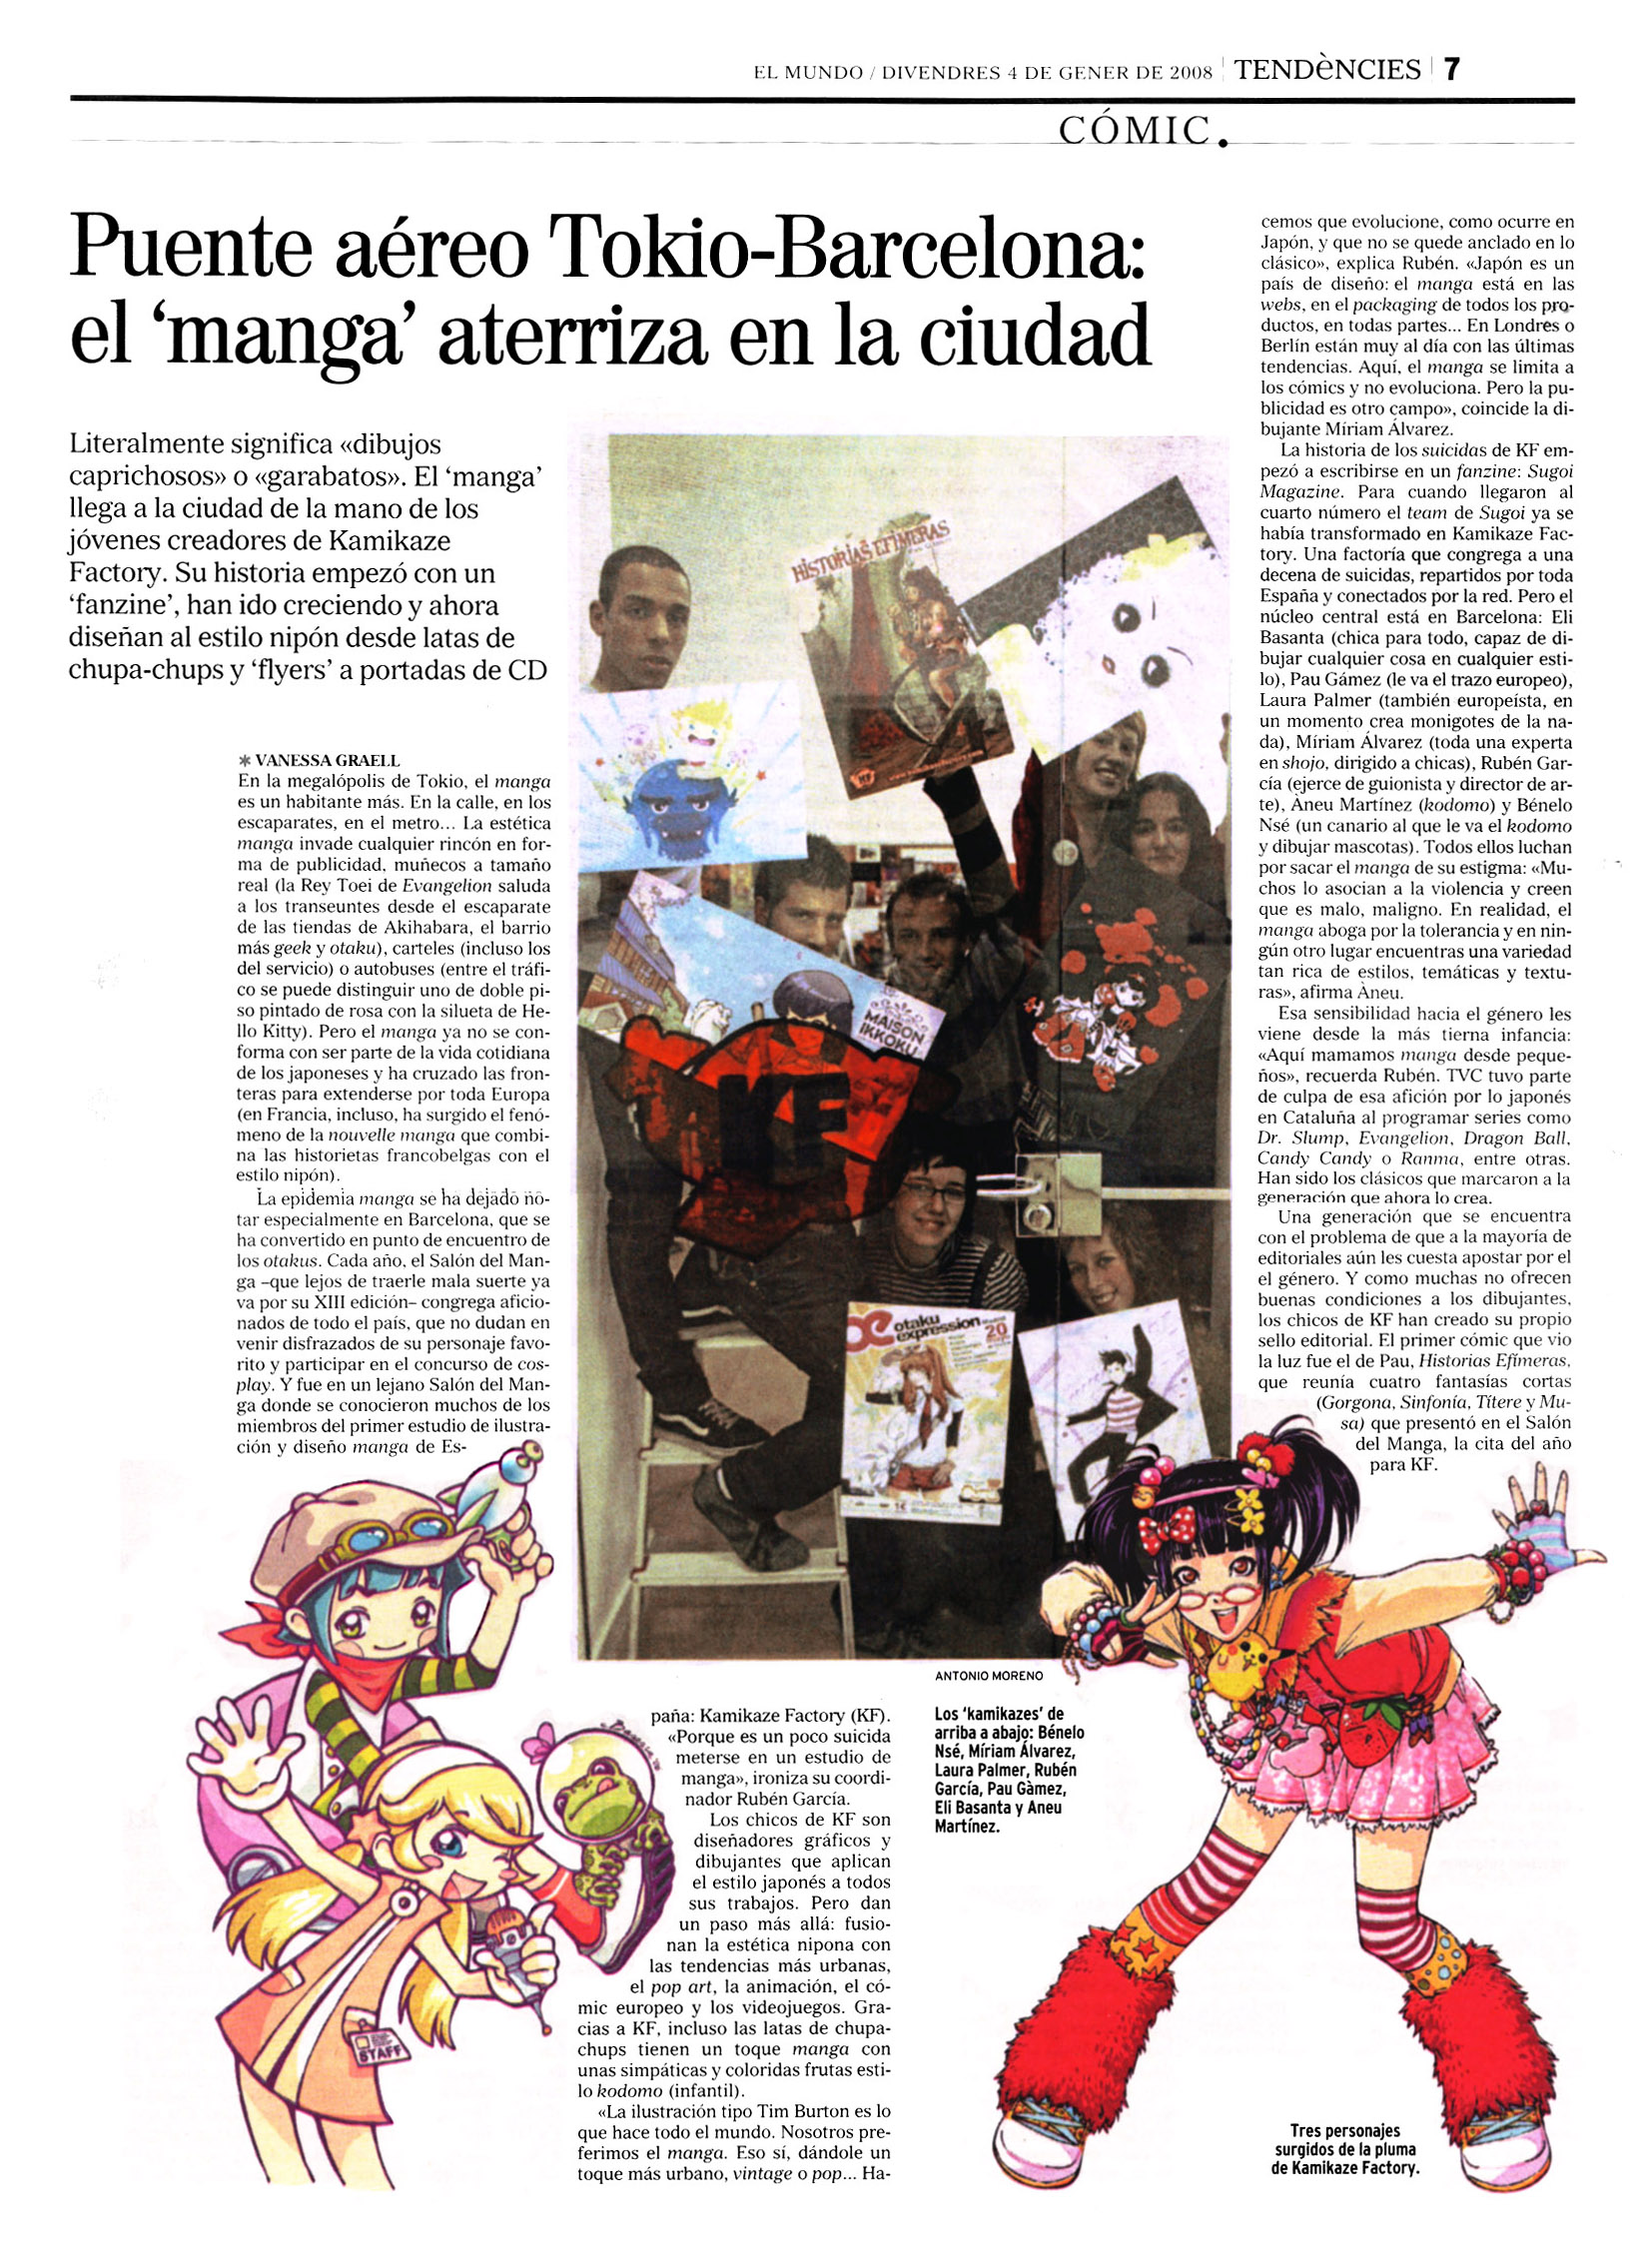 Kamikaze Factory - El Mundo